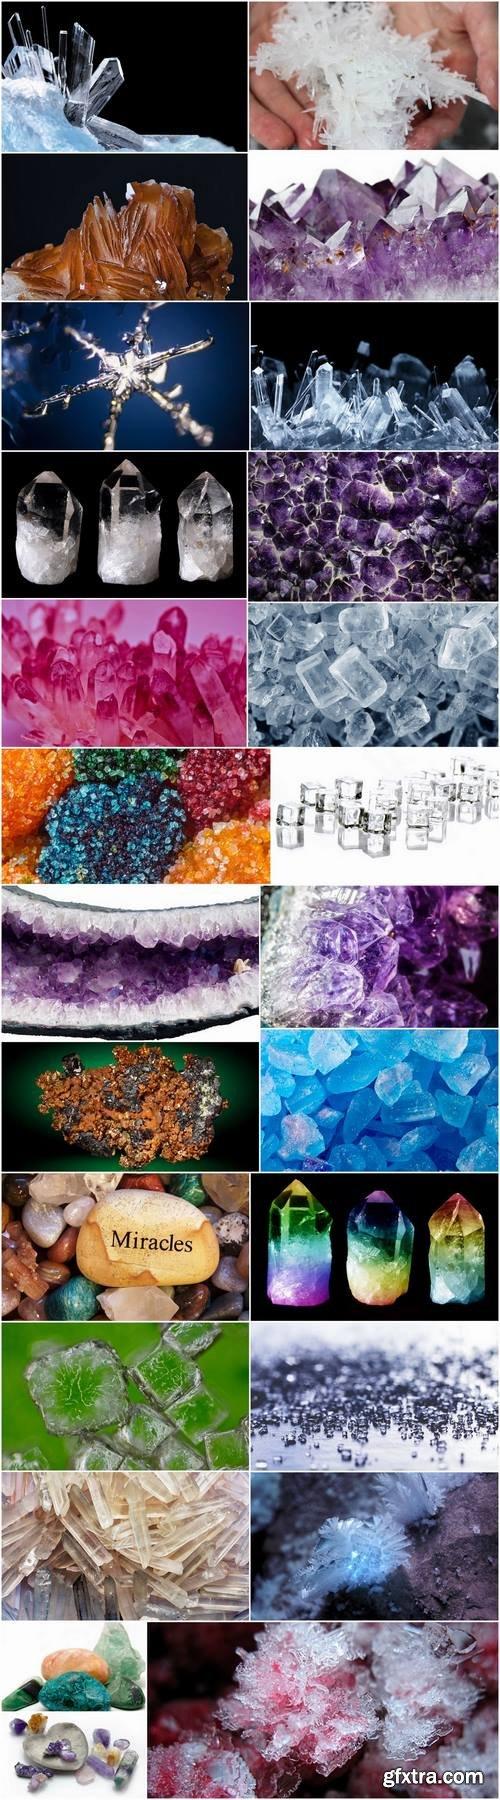 Crystal gem mineral 25 HQ Jpeg